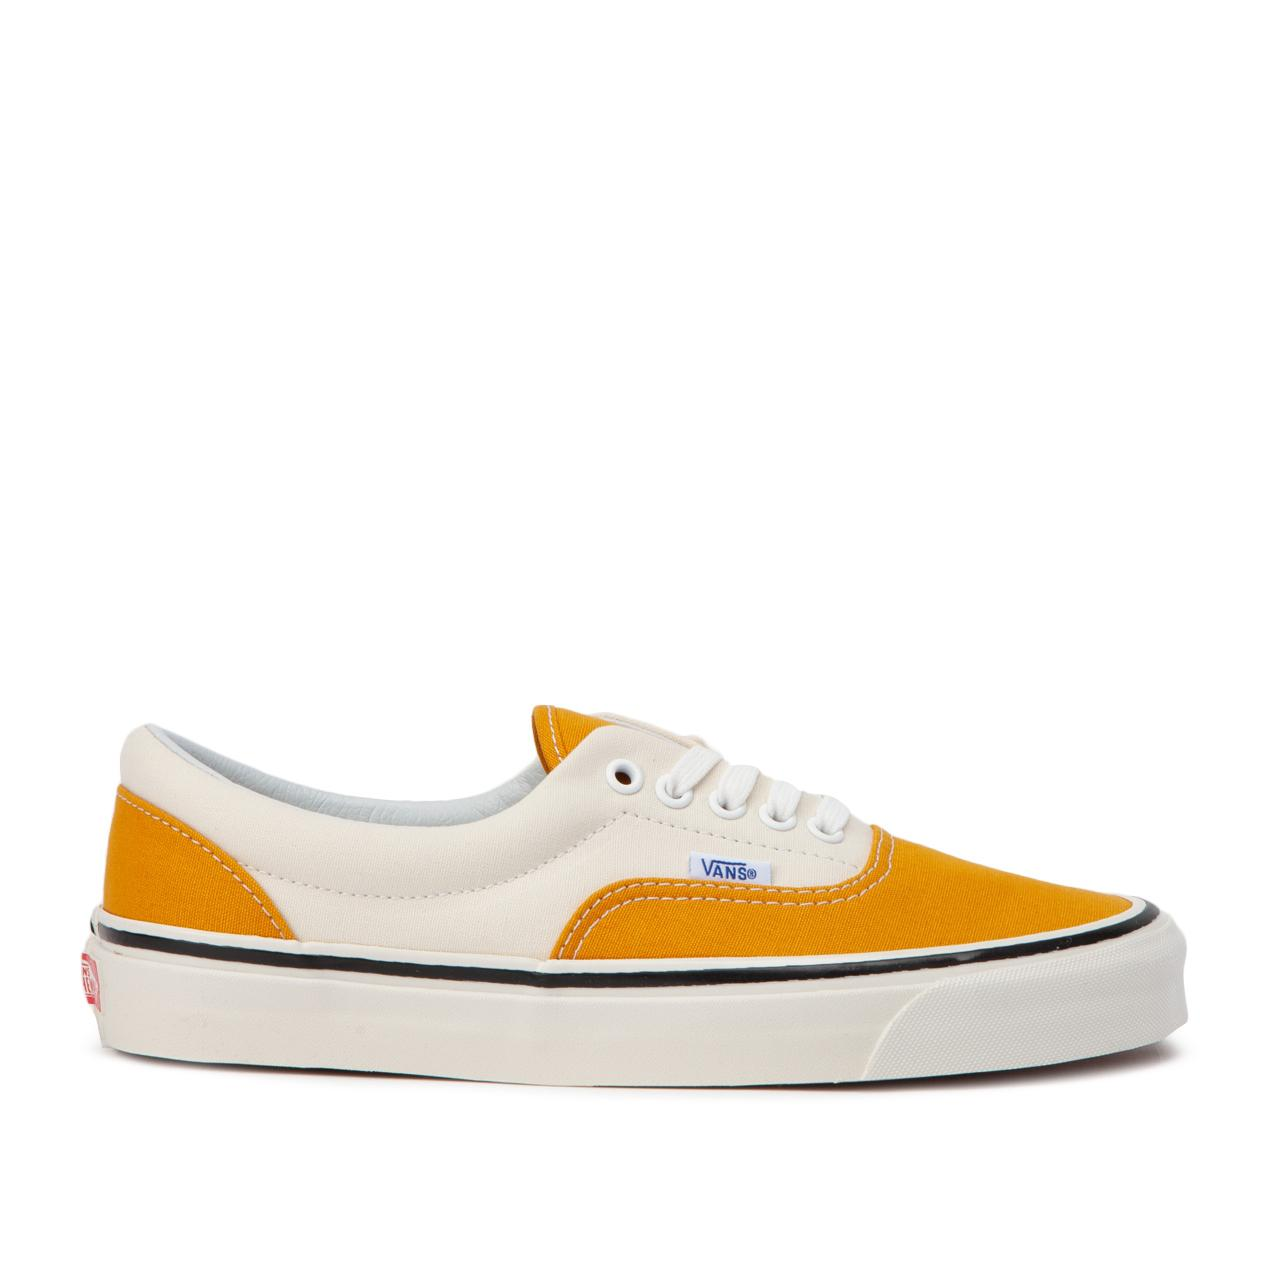 Vans - Yellow Era 95 Dx Anaheim Factory for Men - Lyst. View fullscreen 2bab68c50